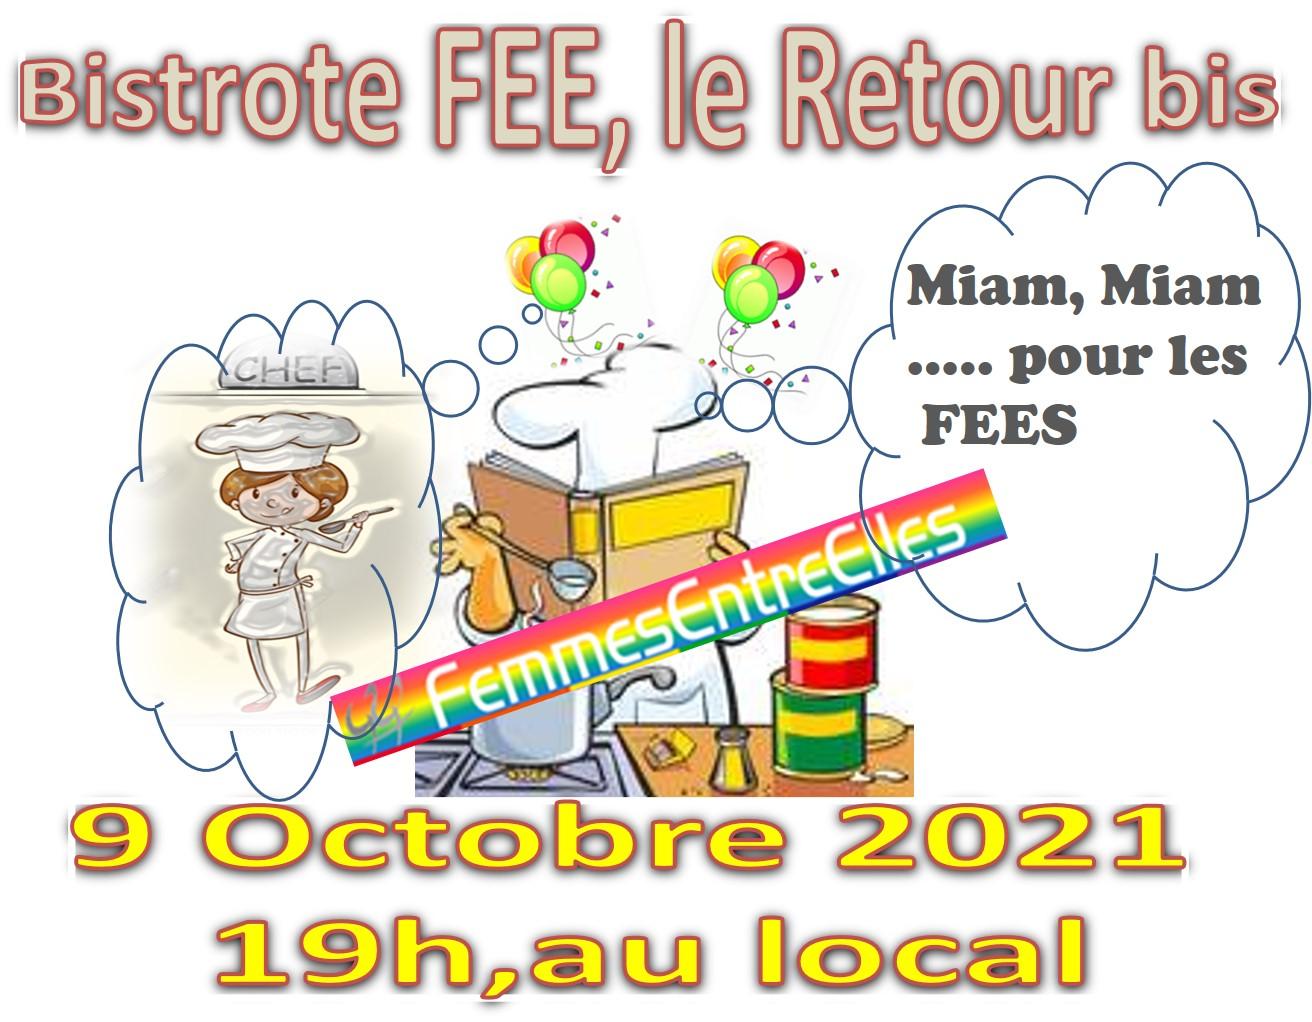 Bistrote au local 9 octobre 2021 à 19h